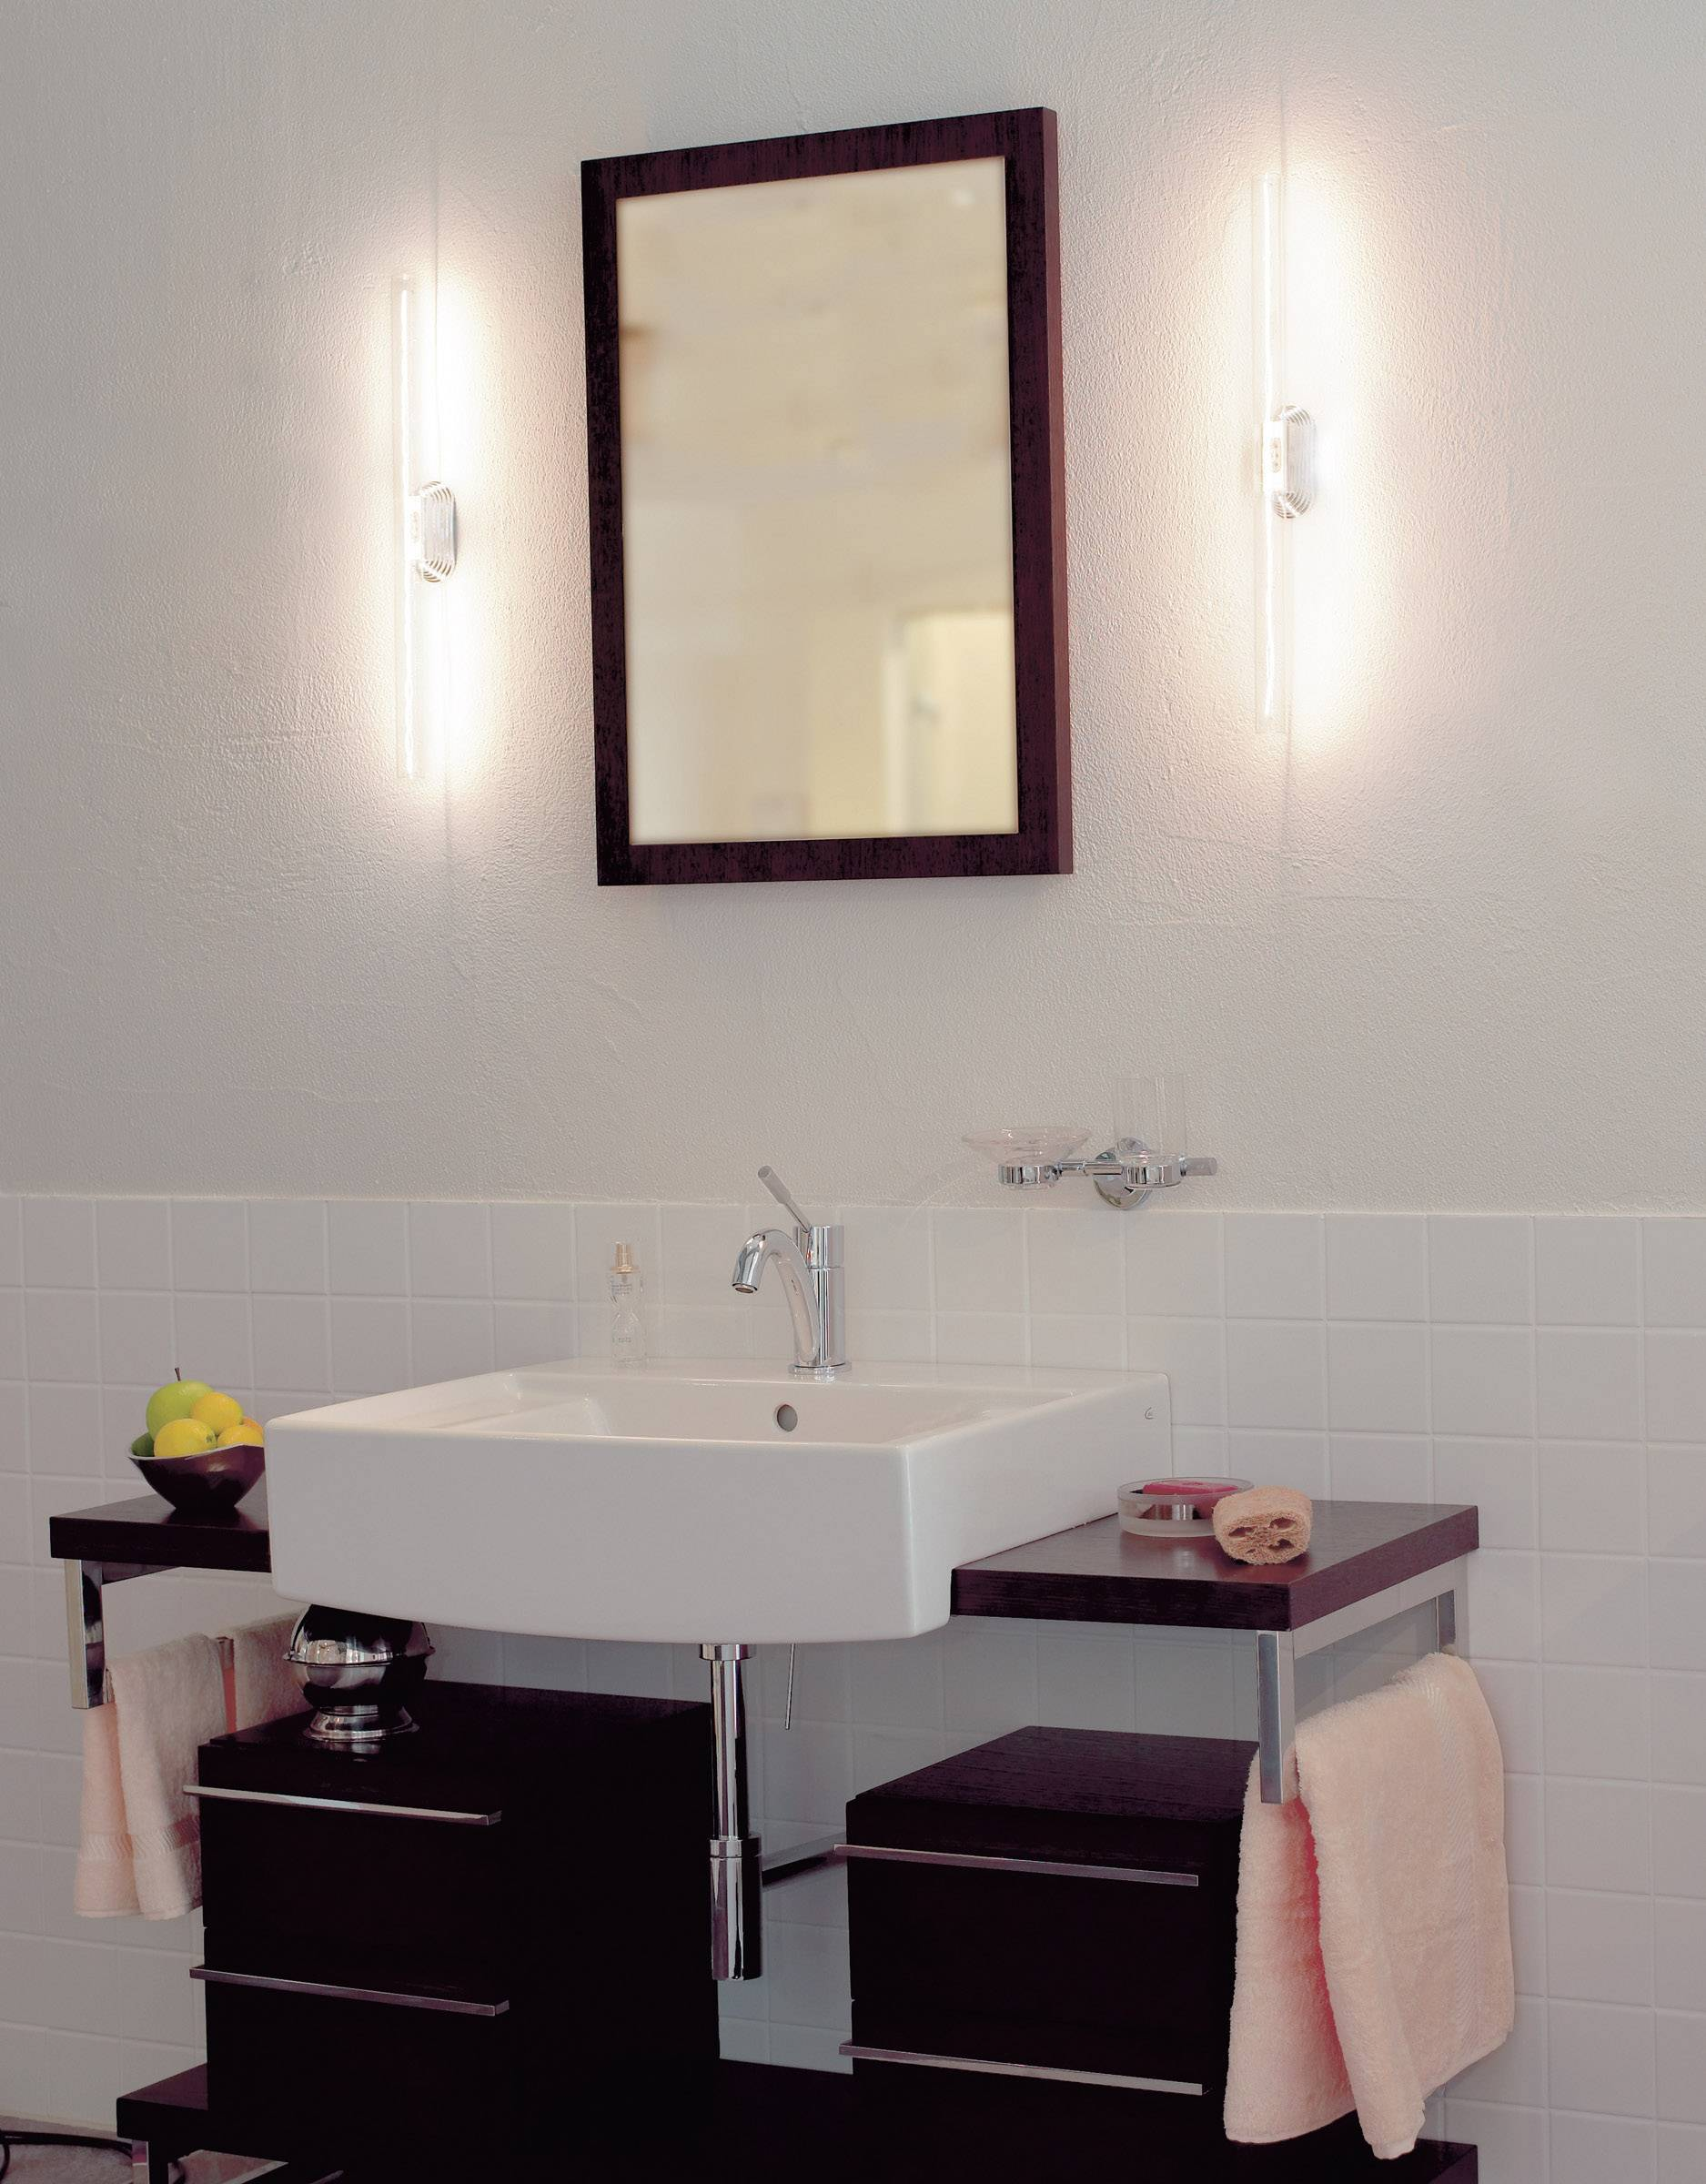 Slv 160702 Wandlamp Voor Badkamer 60 W Chroom Conrad Be